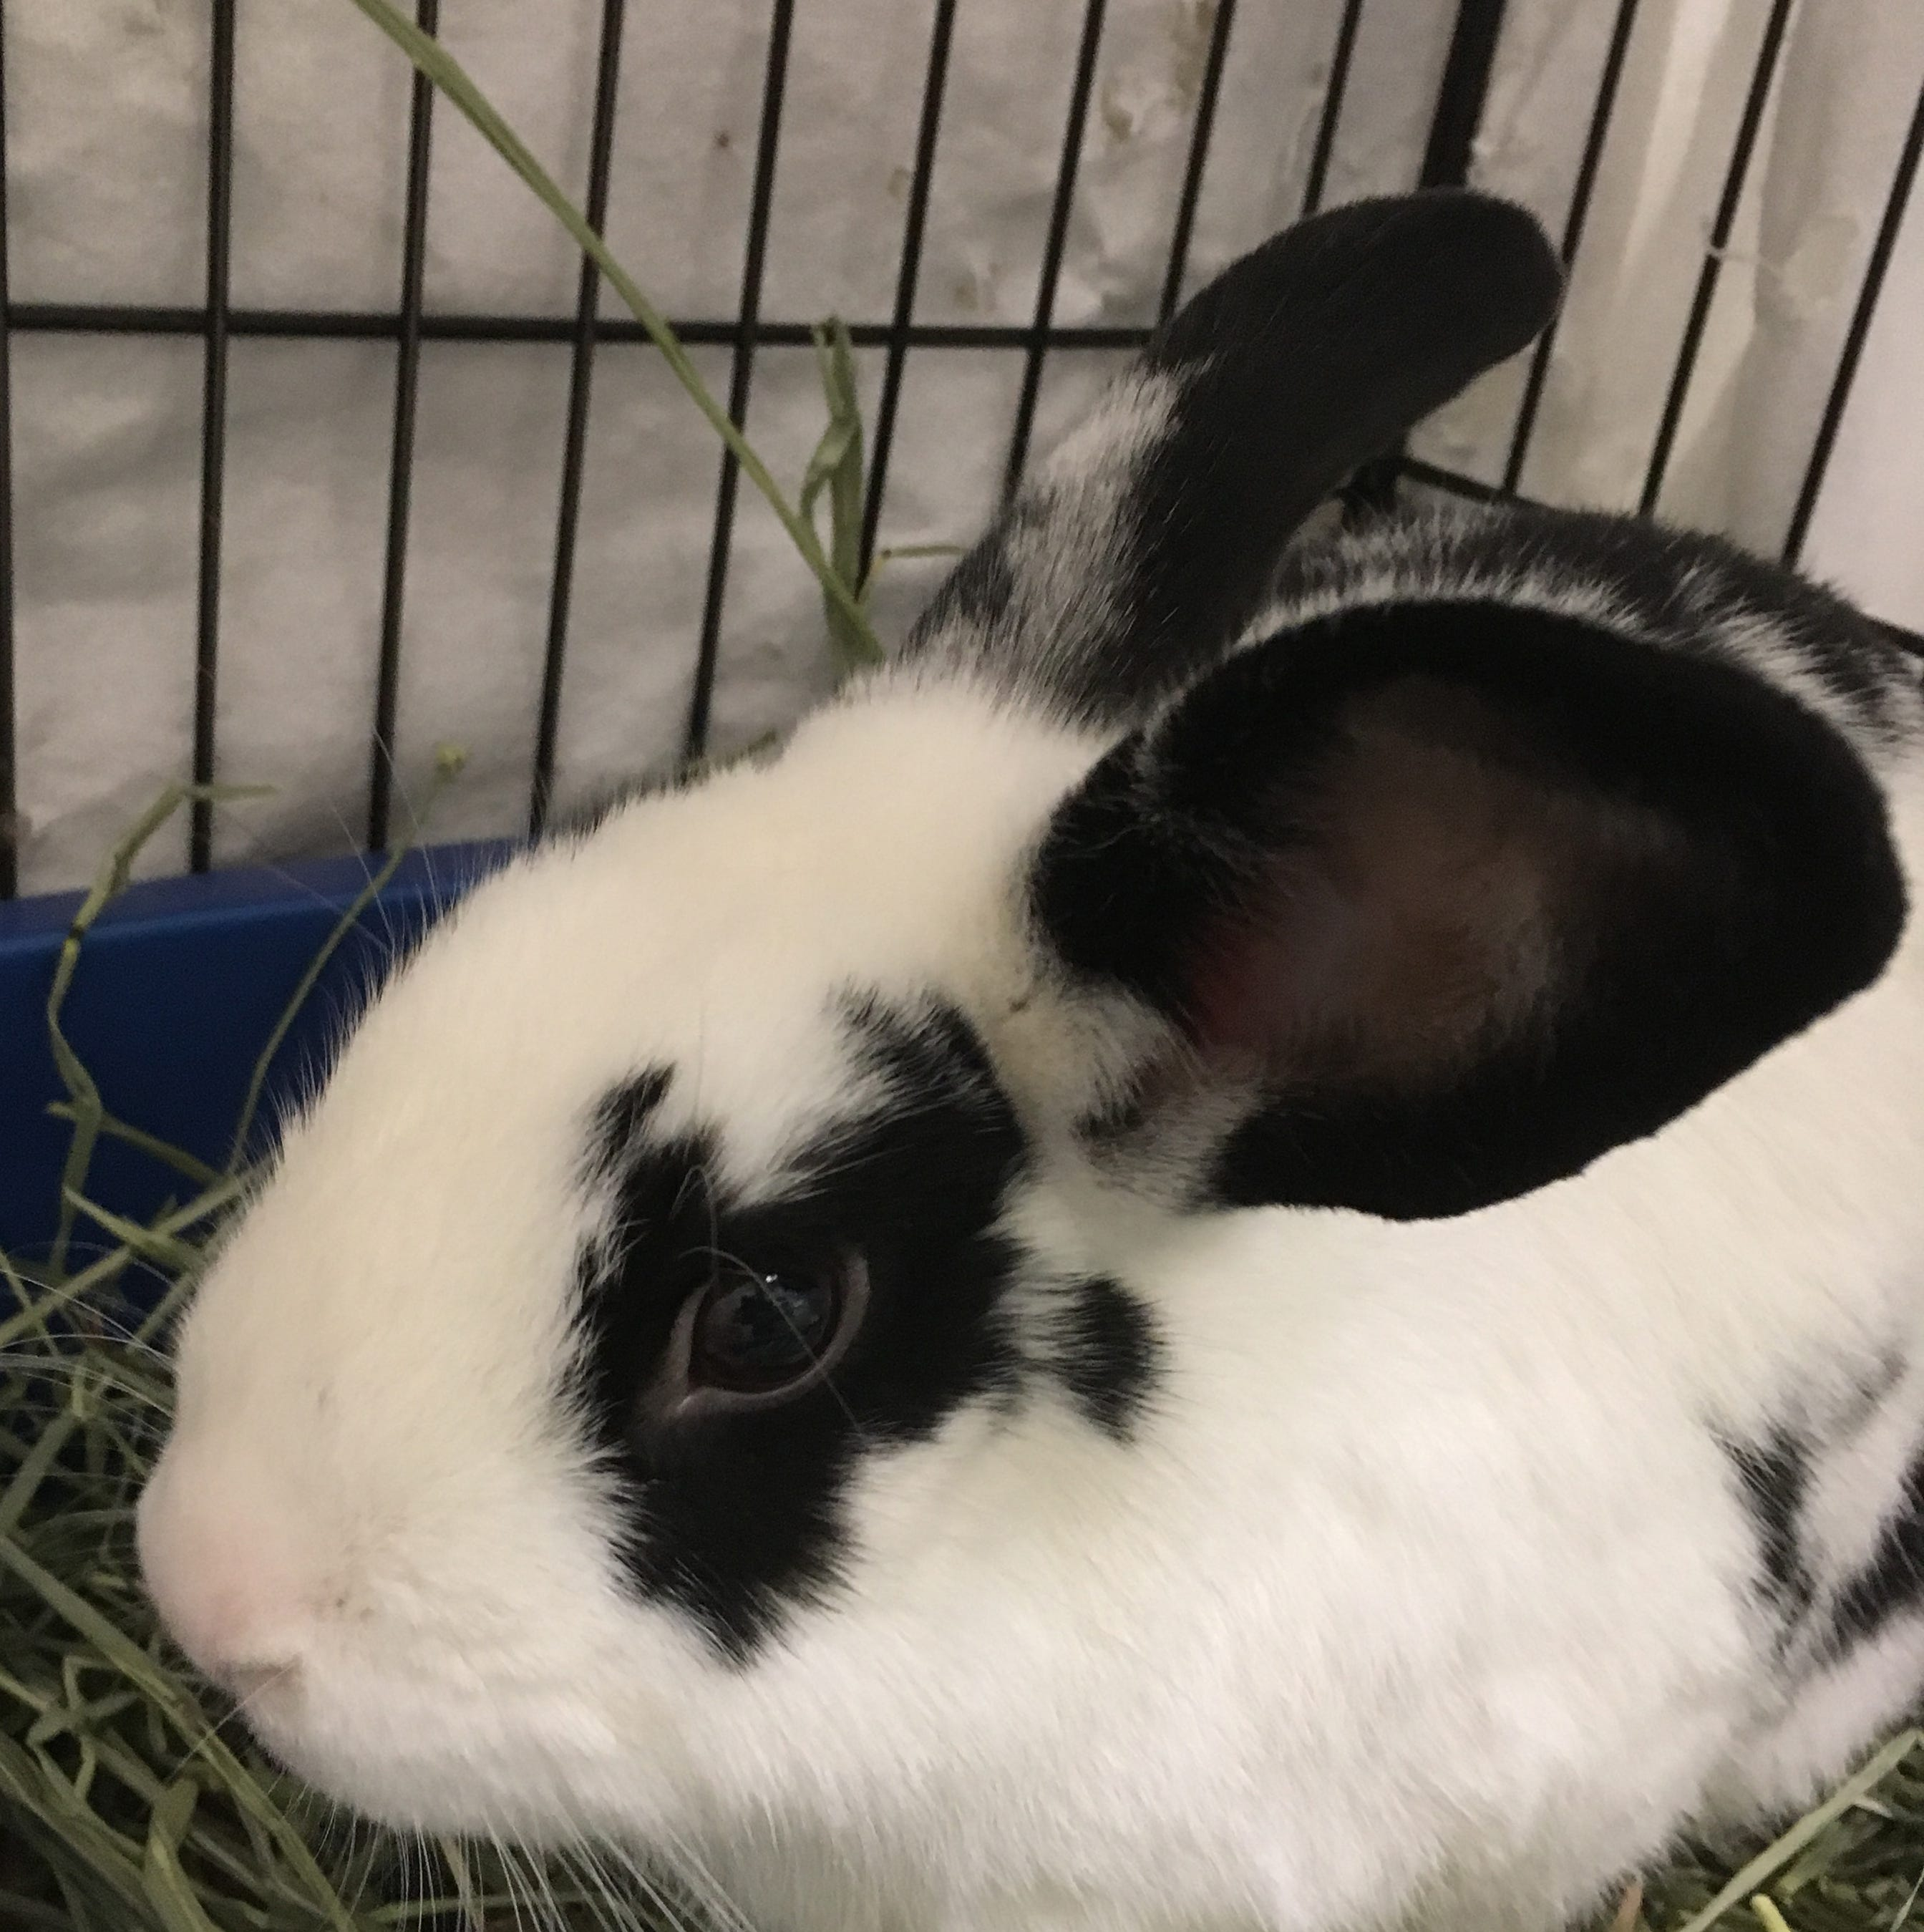 Oshkosh Northwestern Pet of the Week: Bentley the rabbit looks to hop into your life